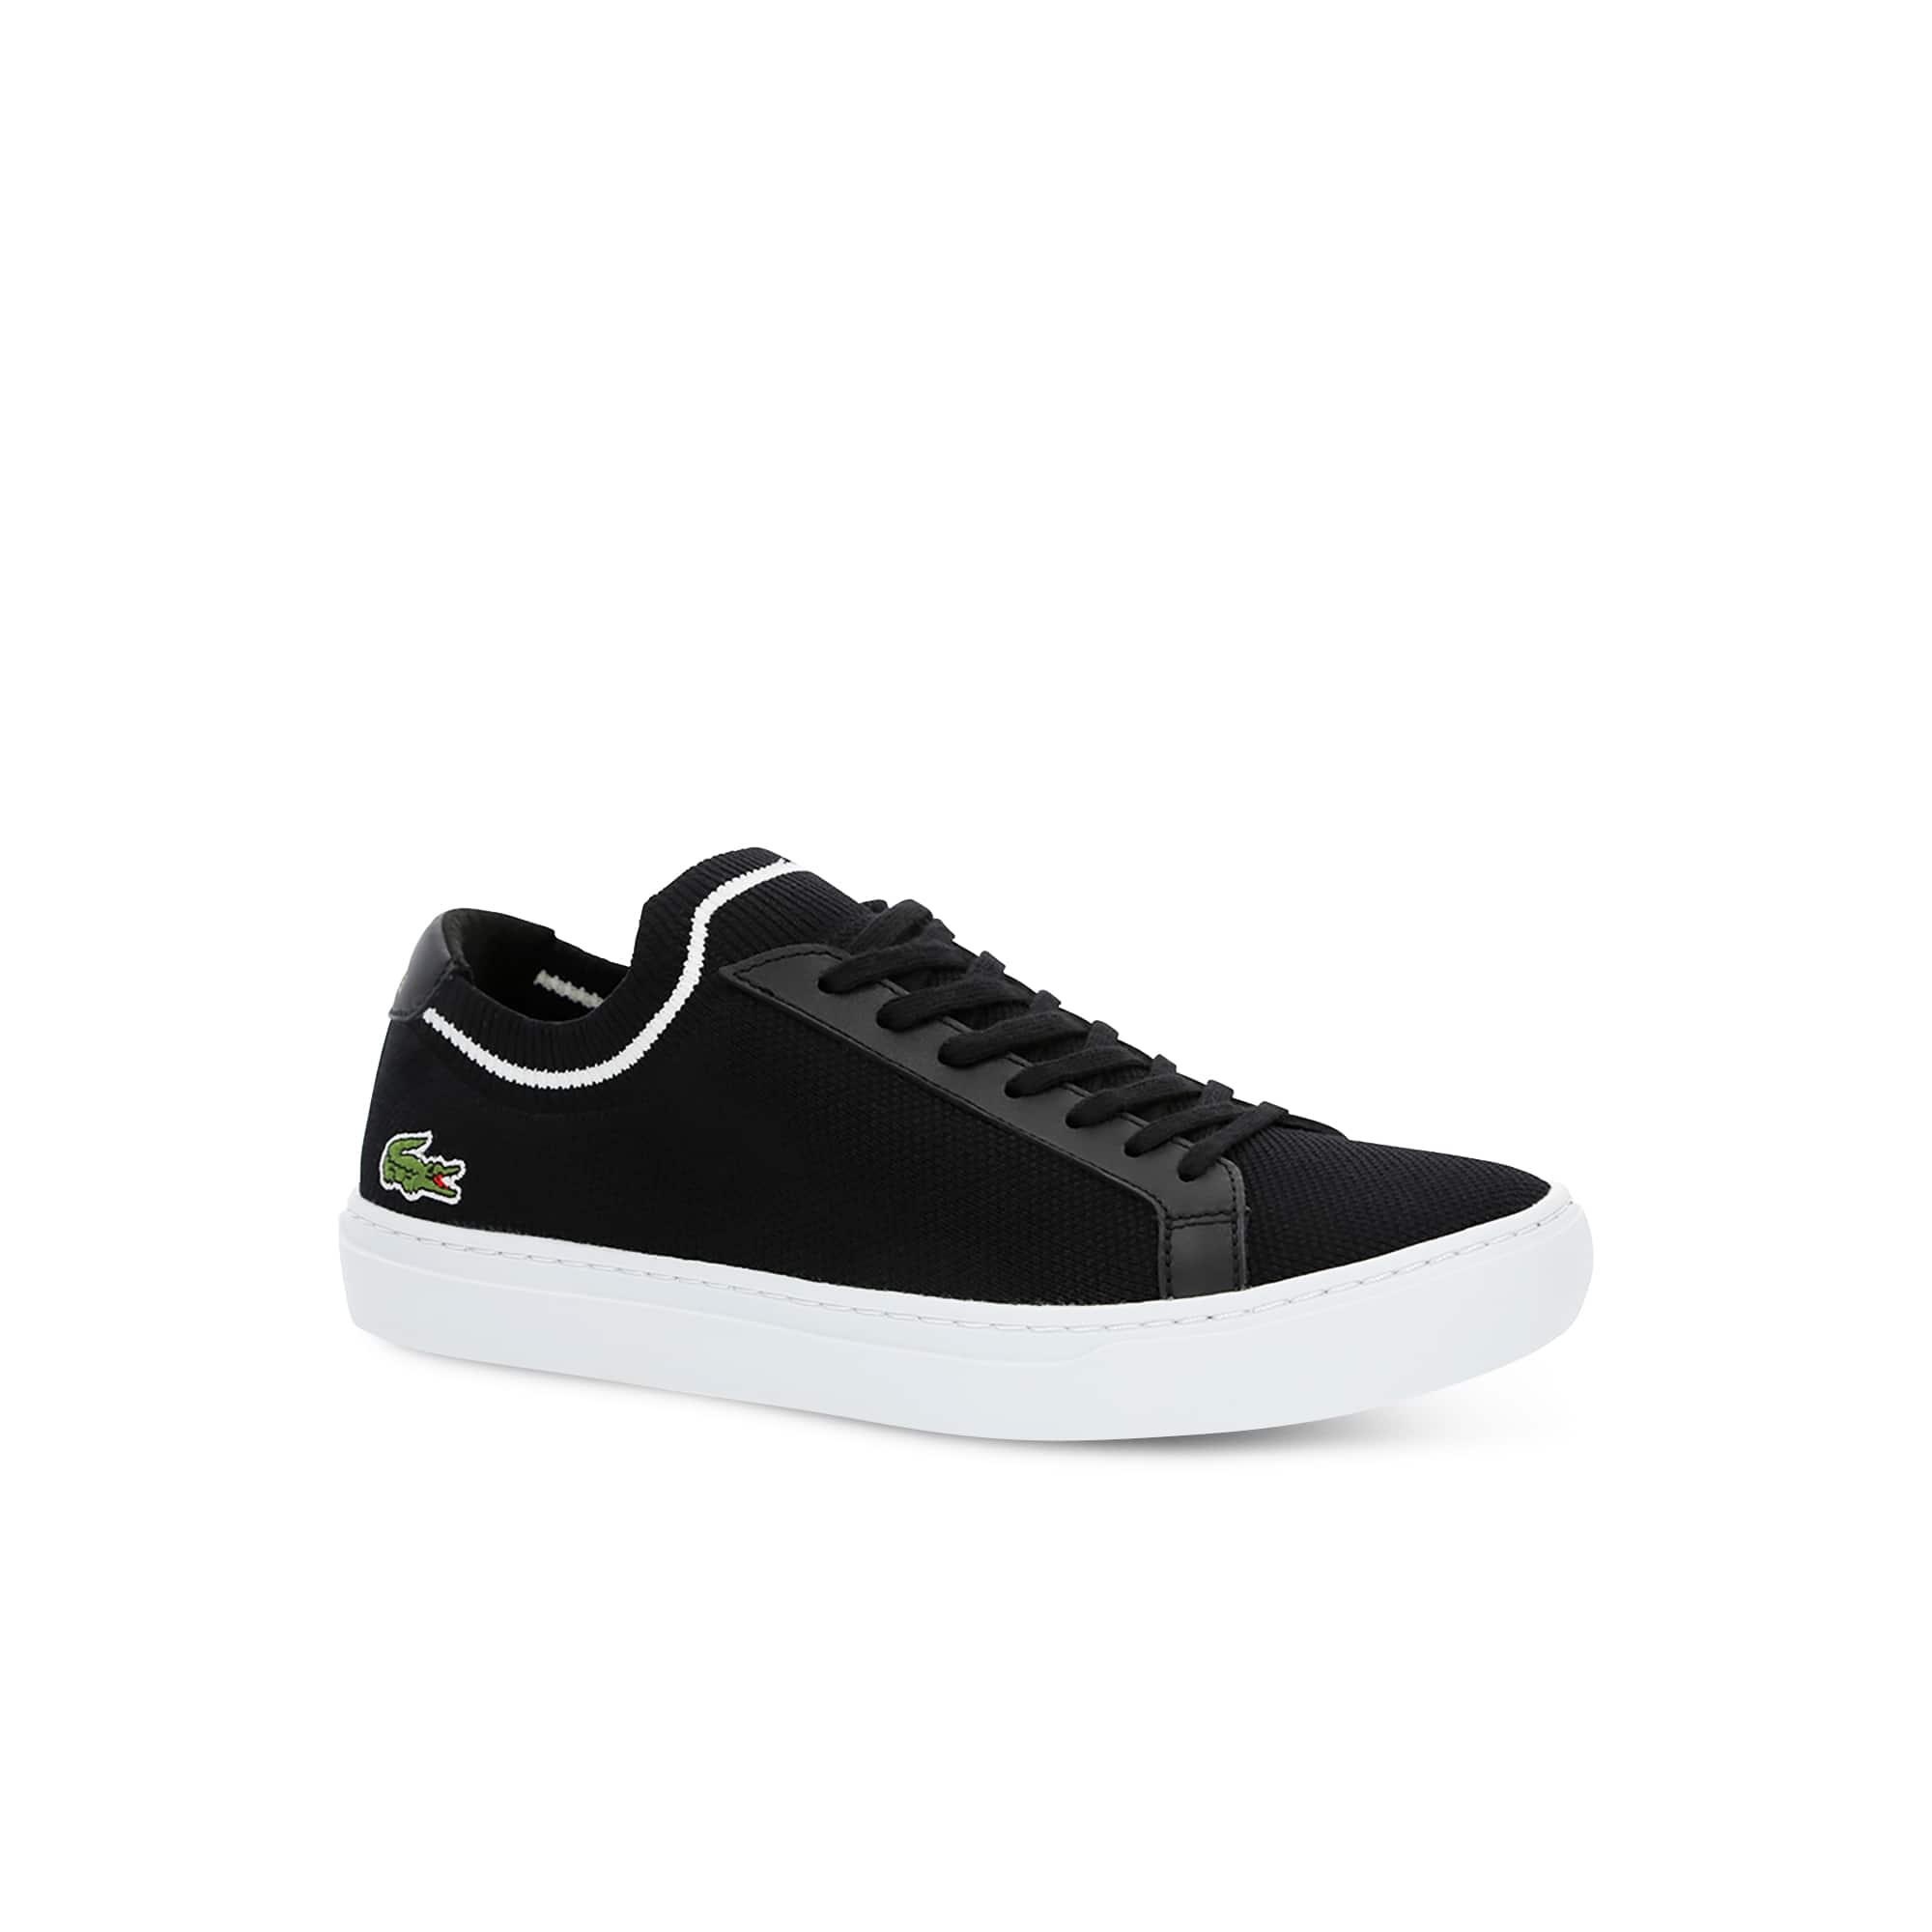 127f92345 أحذية LACOSTE - تسوق جميع أحذية LACOSTE عبر الإنترنت | LACOSTE